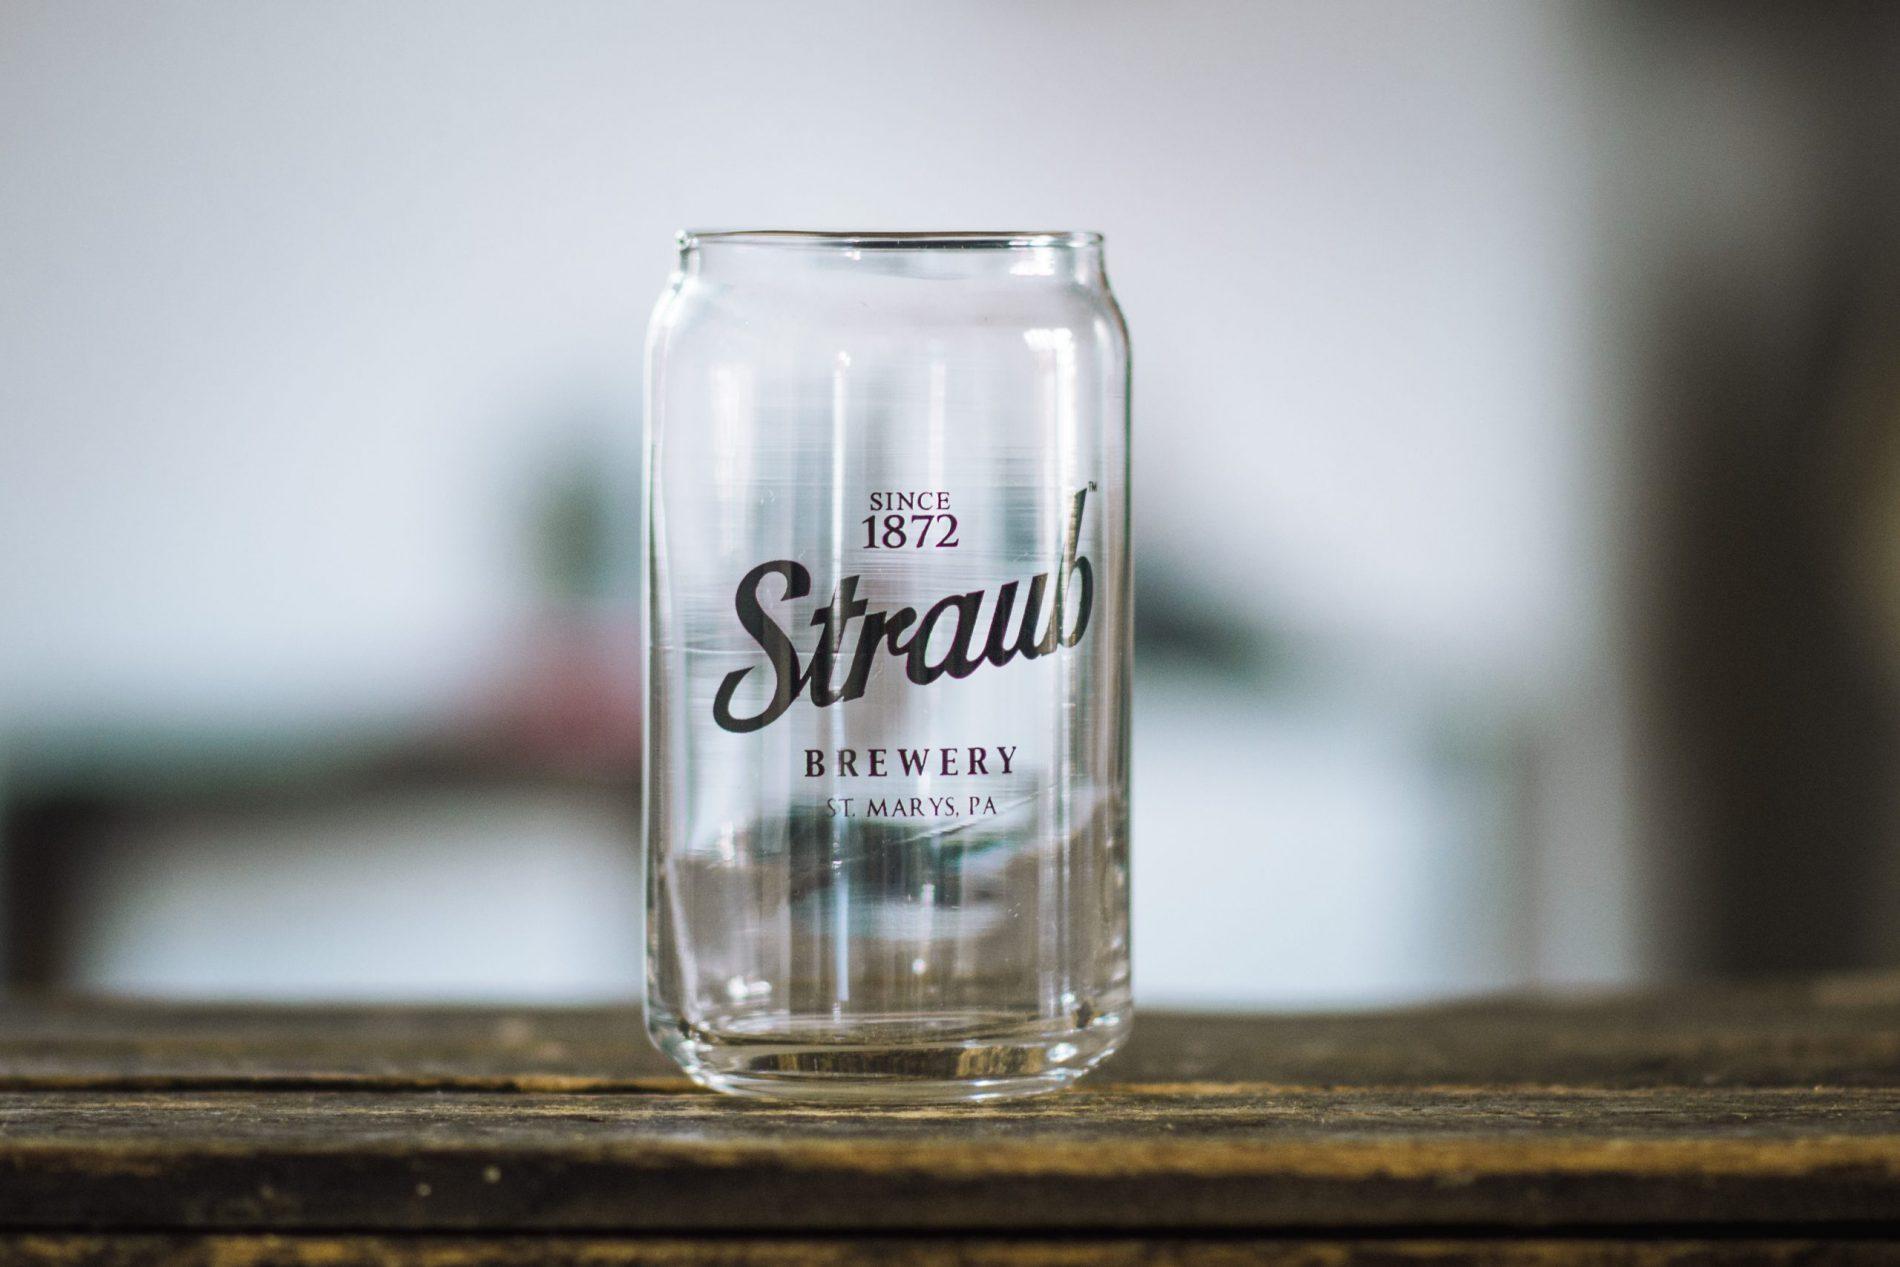 Straub can glass